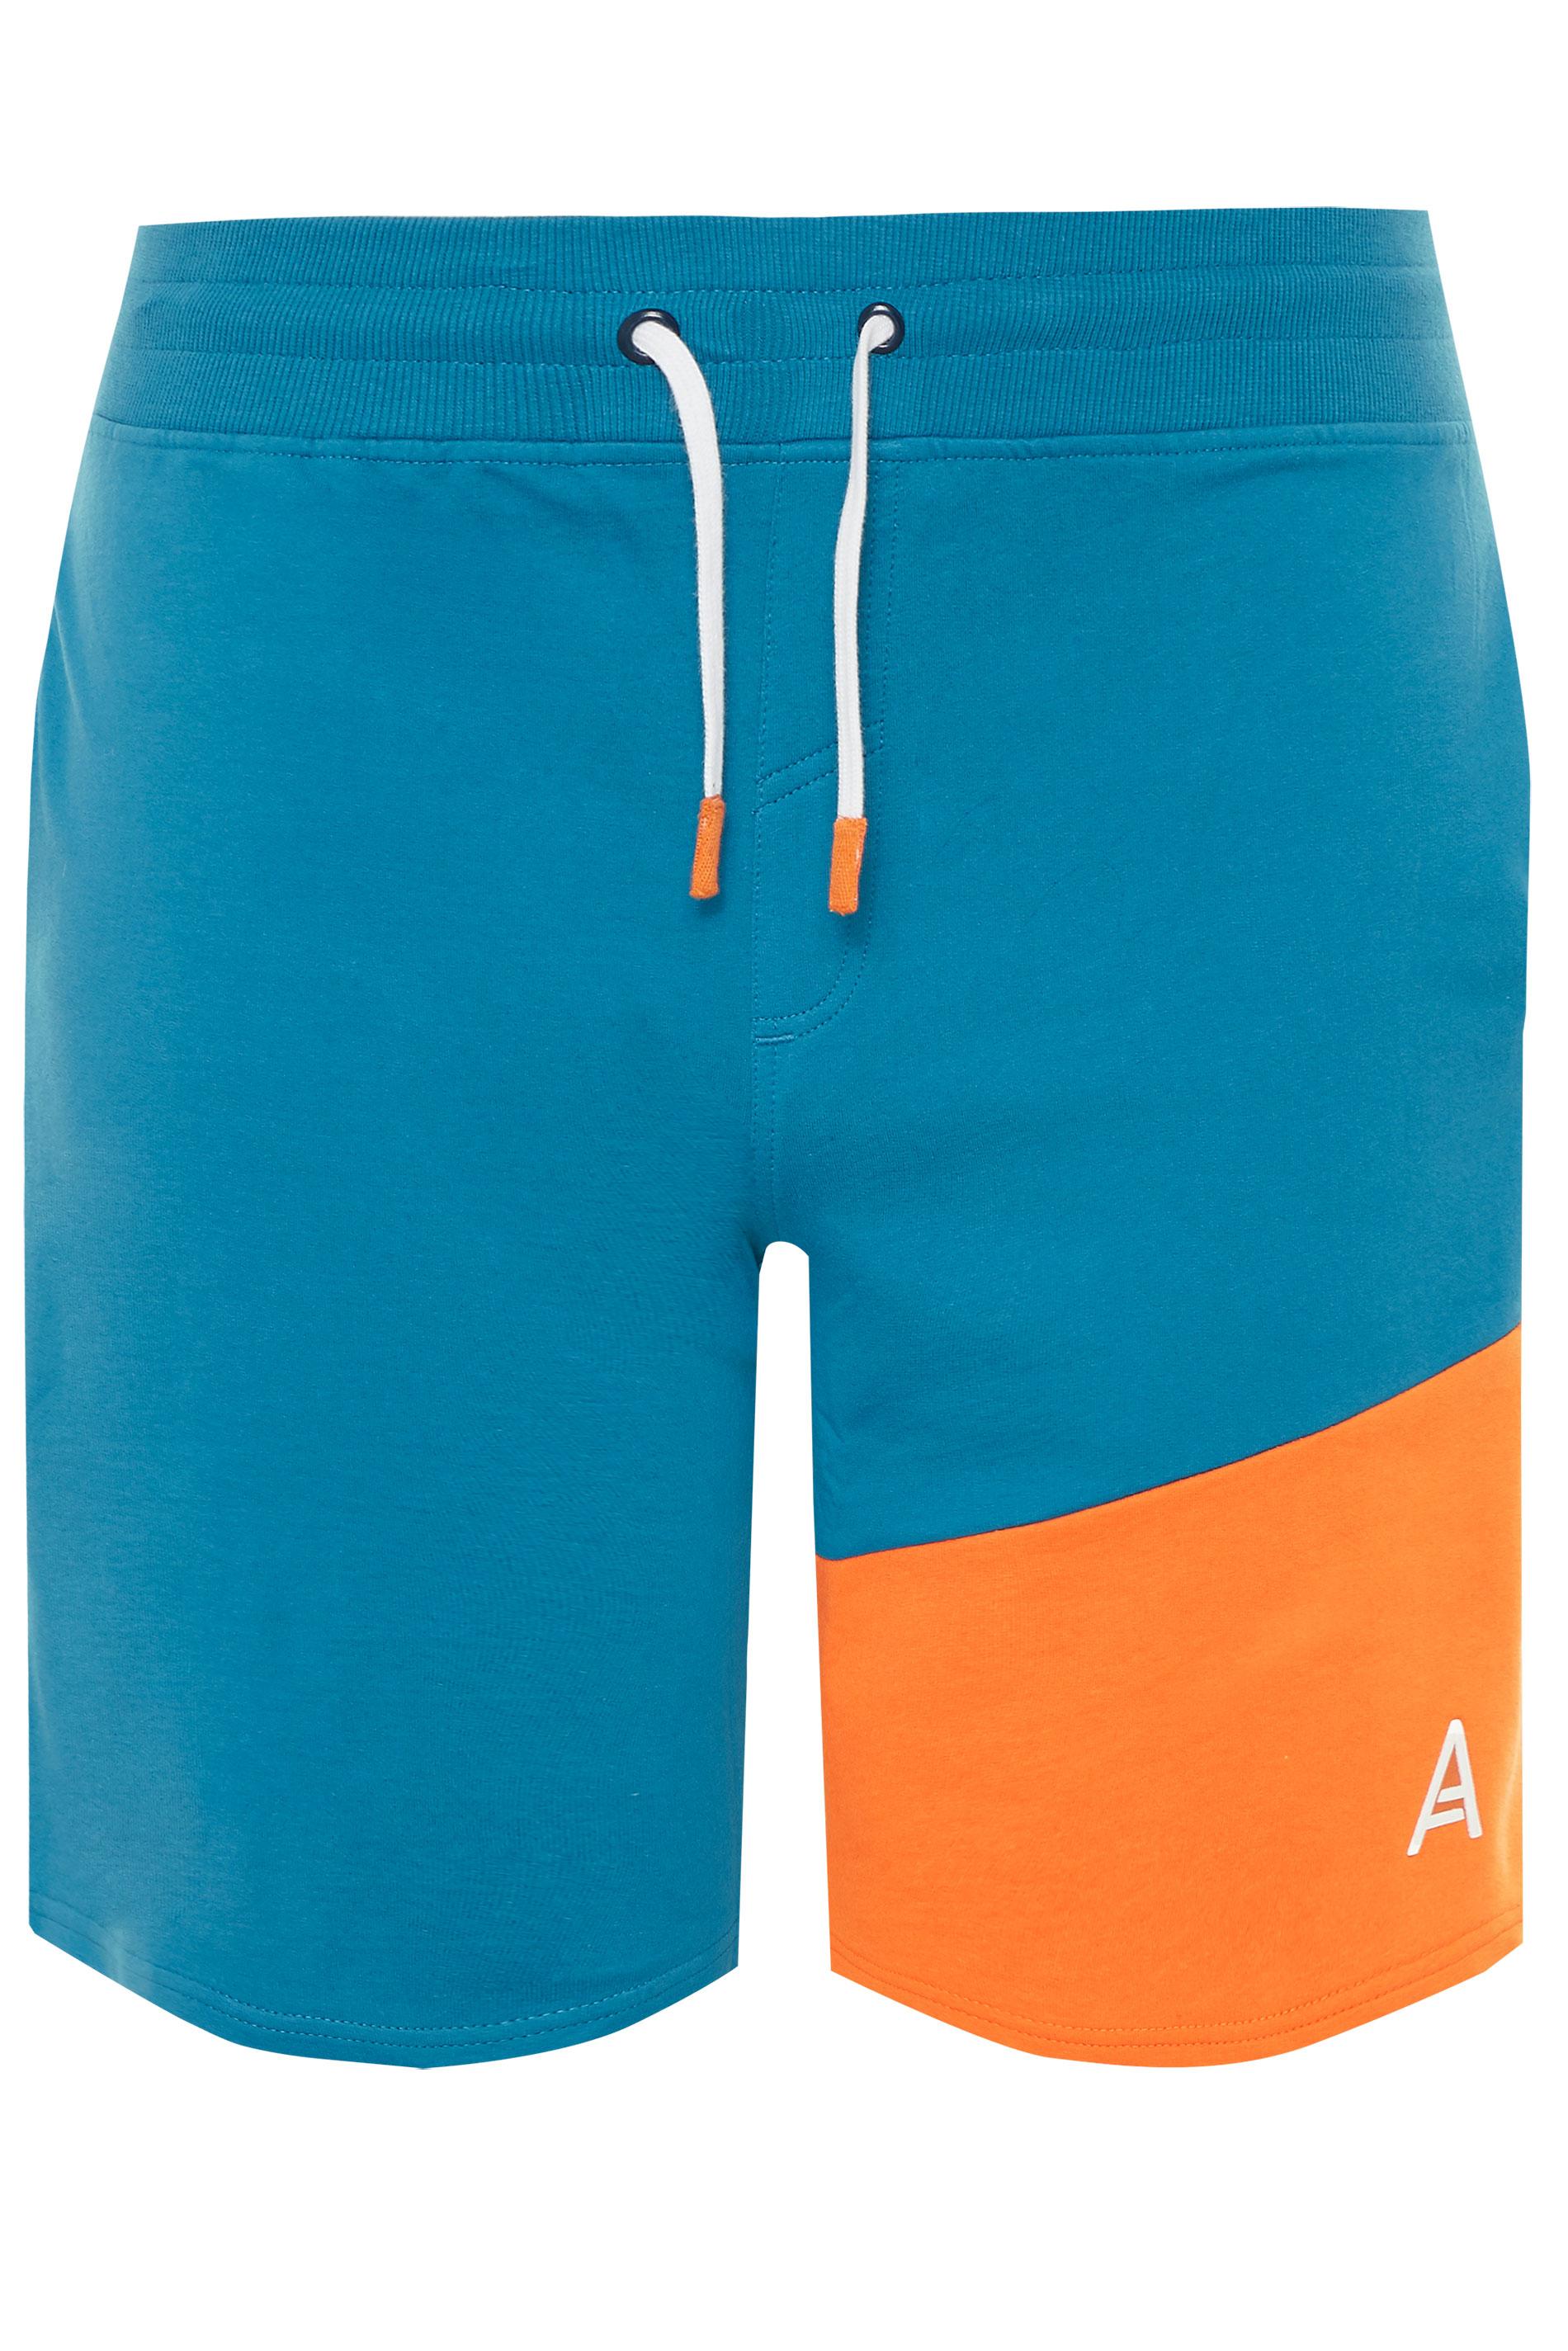 STUDIO A Blue Colour Block Shorts